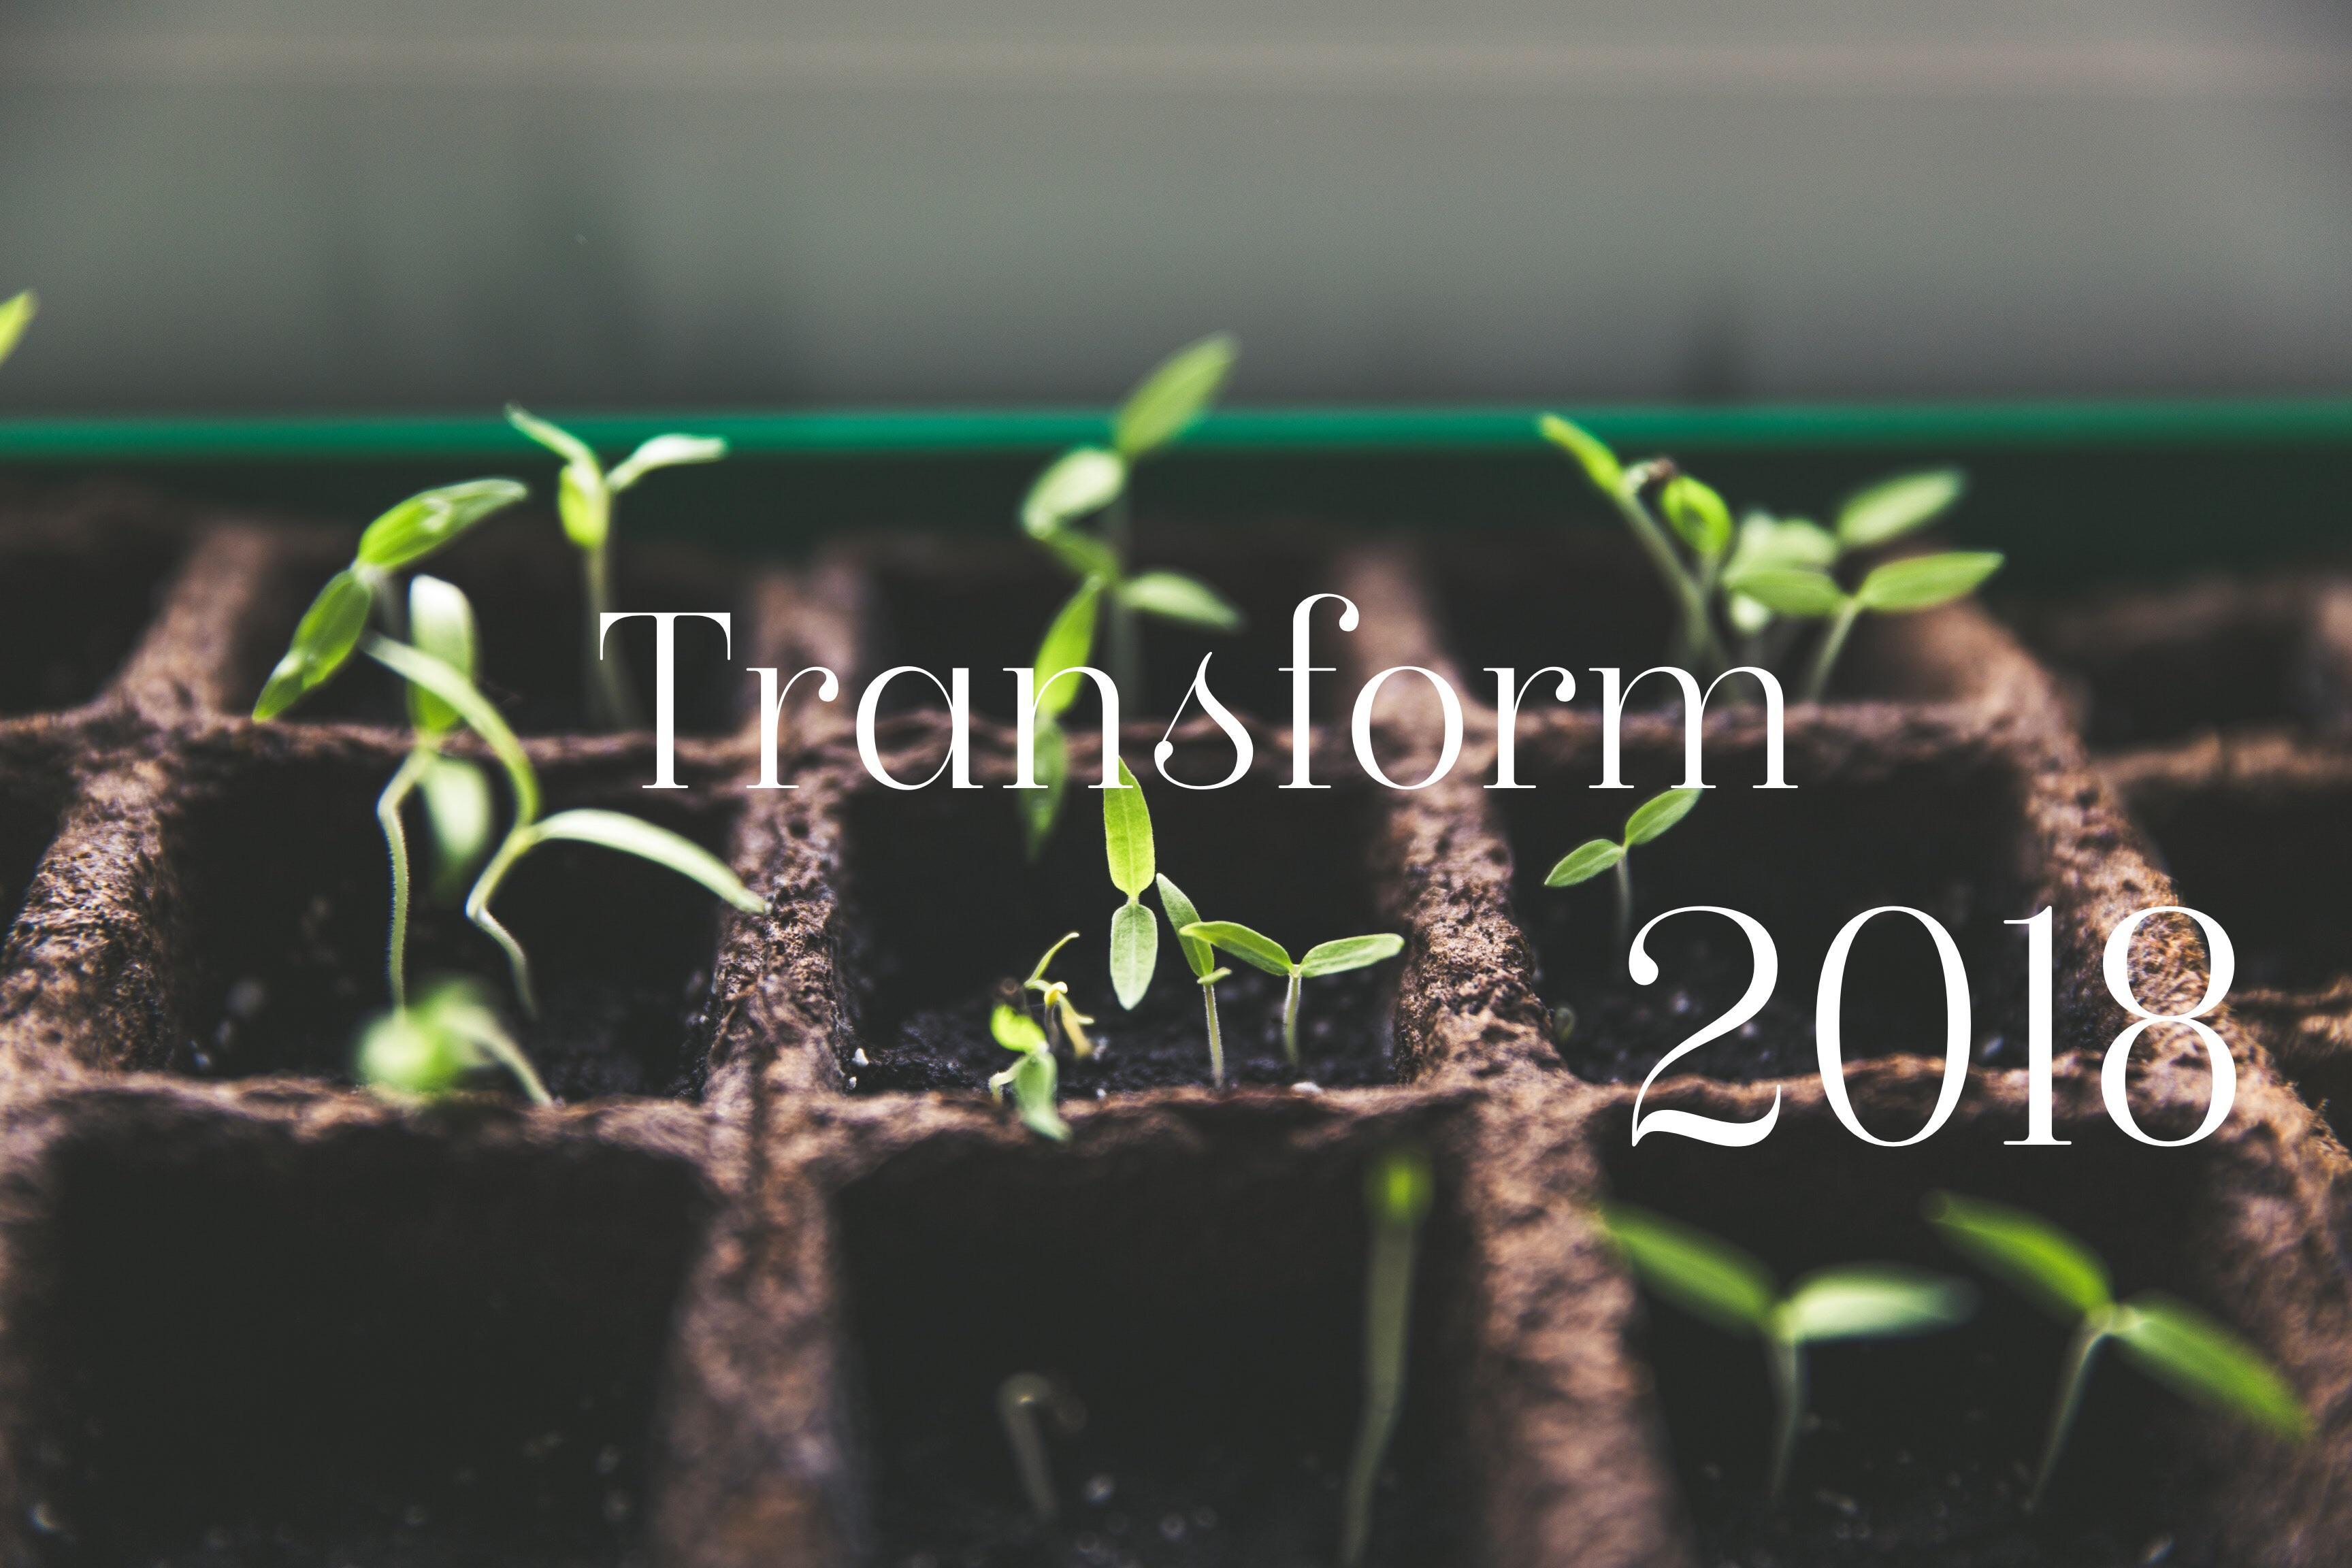 Transform 2018